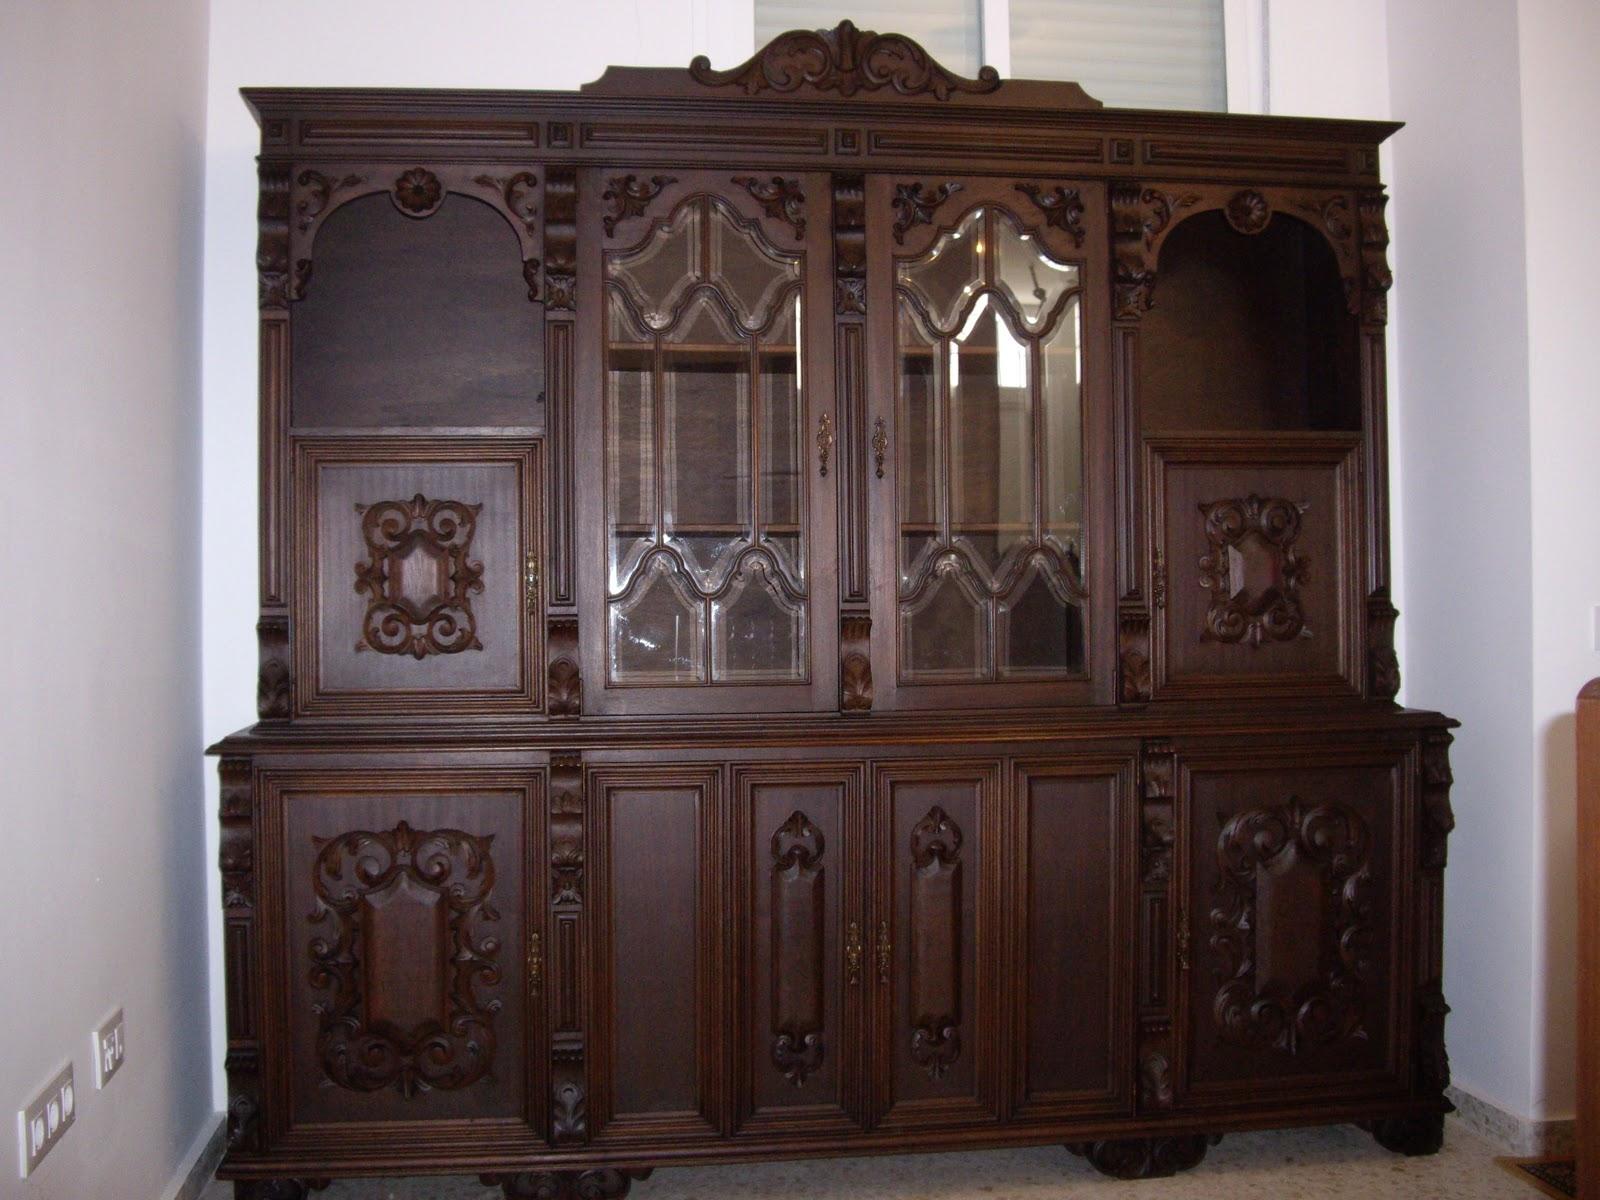 Antiguedades muebles de salon antiguo con mesa de comedor - Muebles de salon antiguos ...